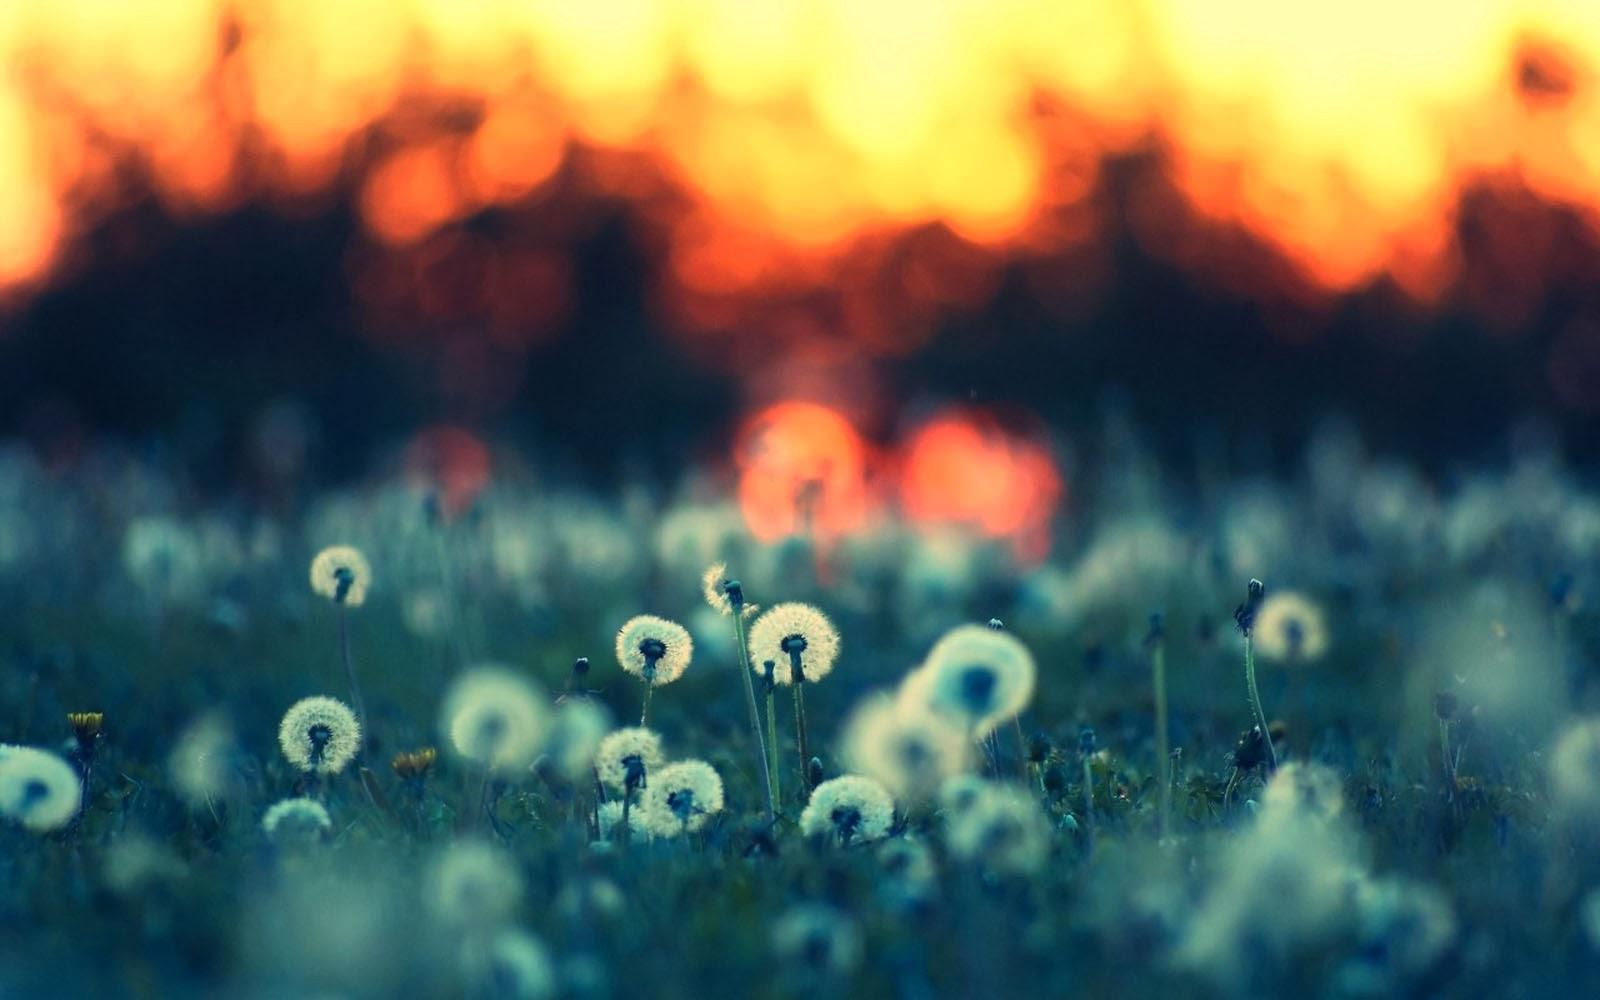 wallpapers: Dandelions In A Field Wallpapers